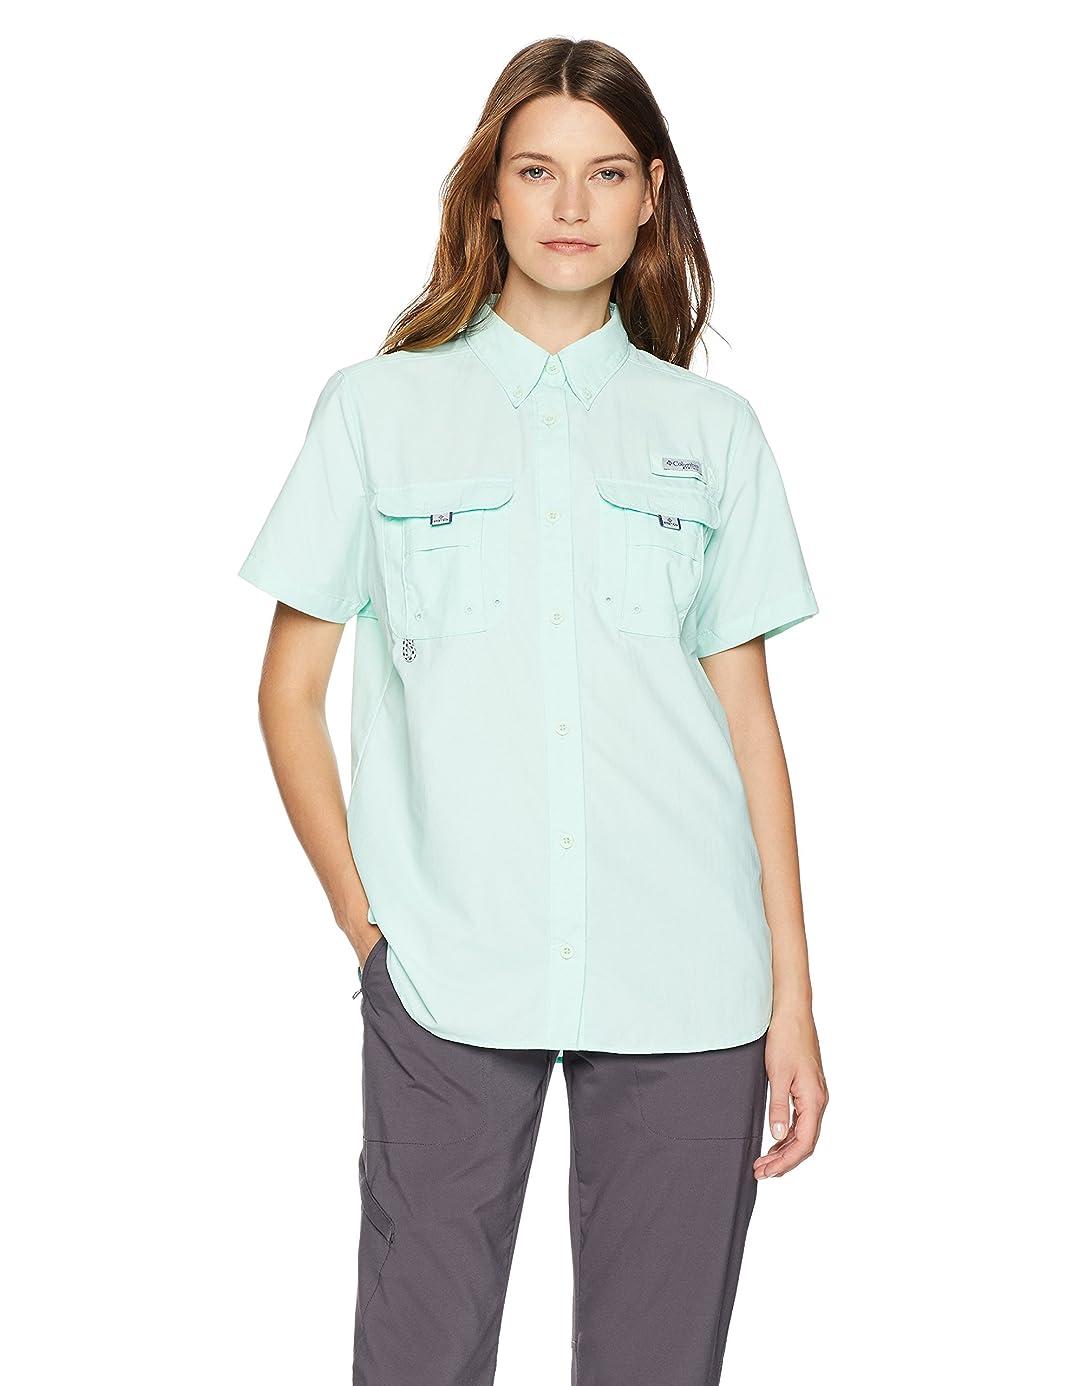 Columbia Standard Womens Bahama Short Sleeve, Sea Ice, Large rjc0016241